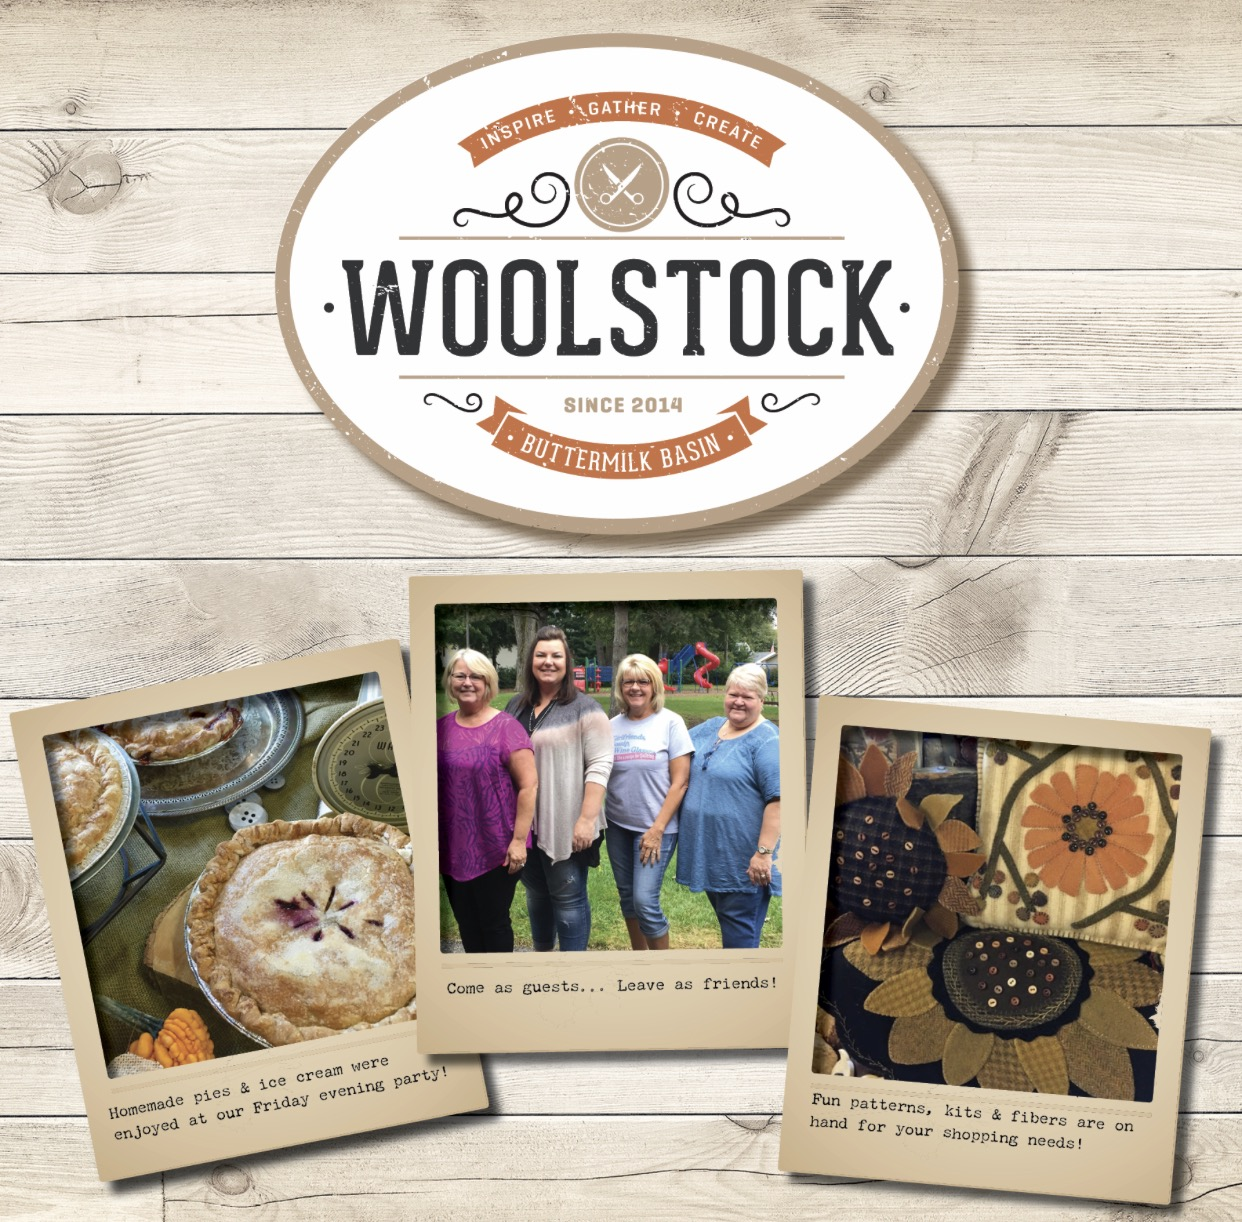 woolstock guys Premium models from quartz countertops guys in woolstock,  quartz countertops in woolstock, ia quartz countertops in woolstock, ia woolstock, ia, usa.